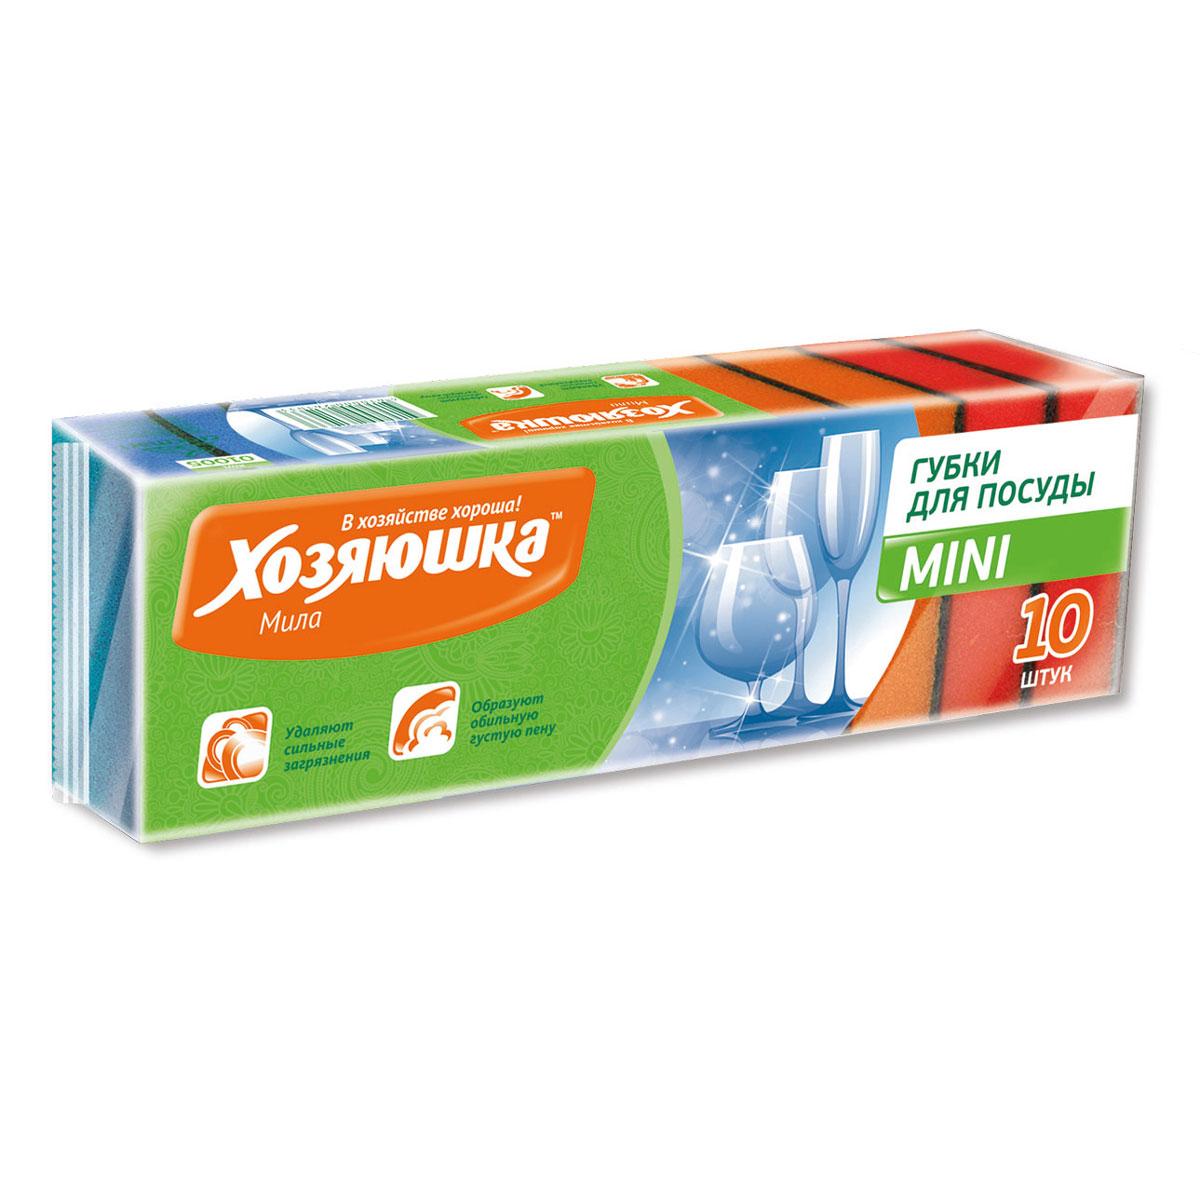 "Набор губок для мытья посуды Хозяюшка Мила ""Mini"", 10 шт"